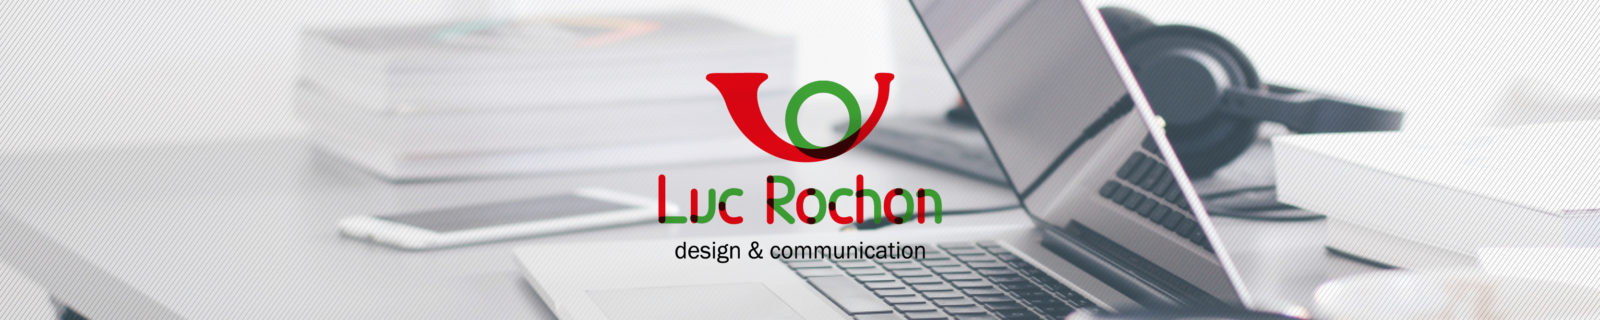 Luc Rochon